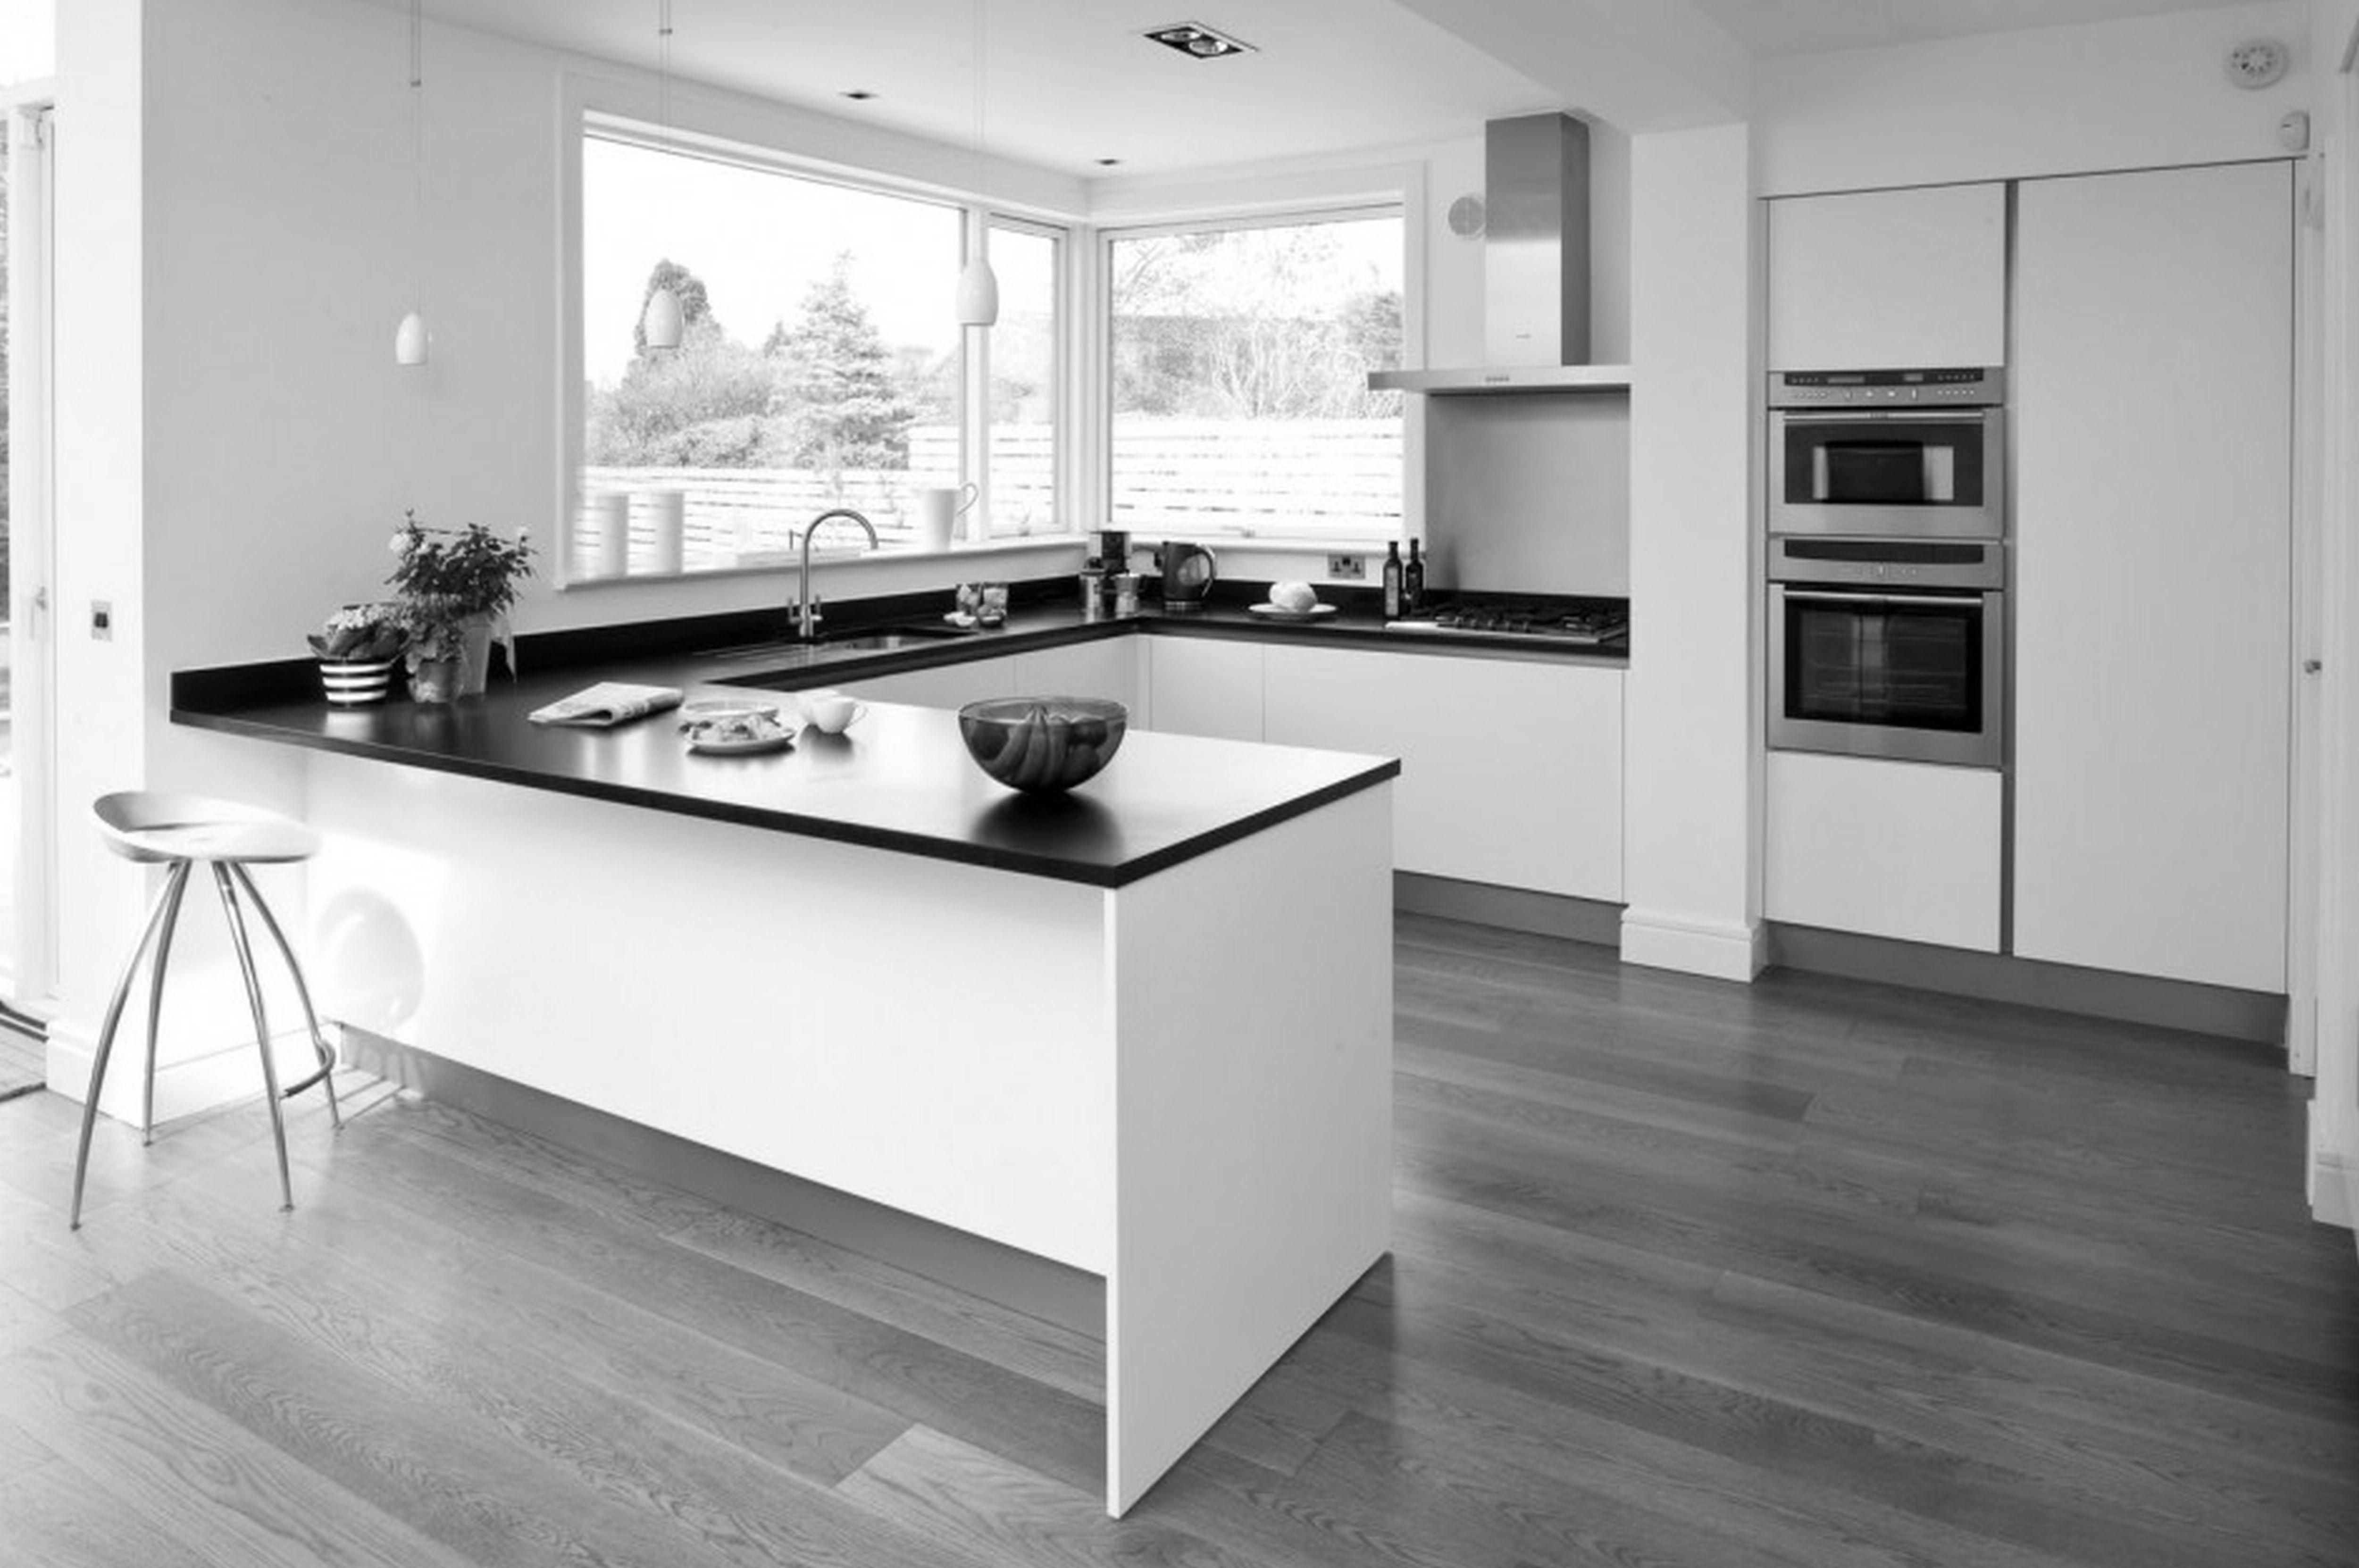 Modern l shaped kitchen designs with island sodakaustica